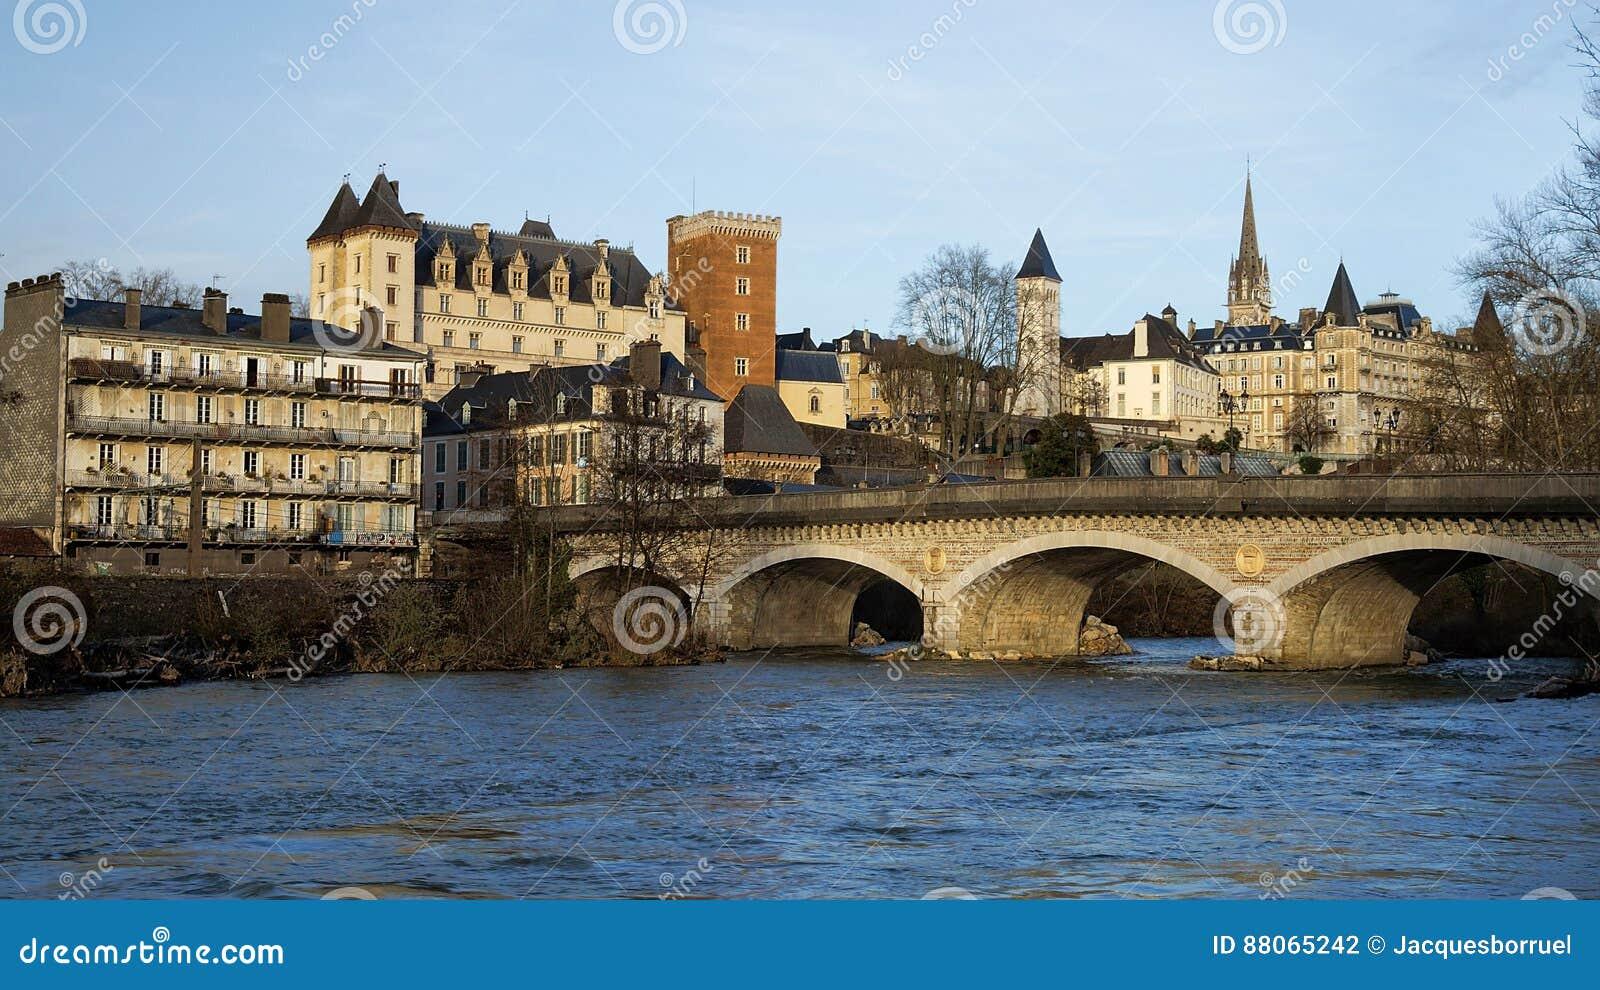 castle of pau france stock photo image of culture france 88065242